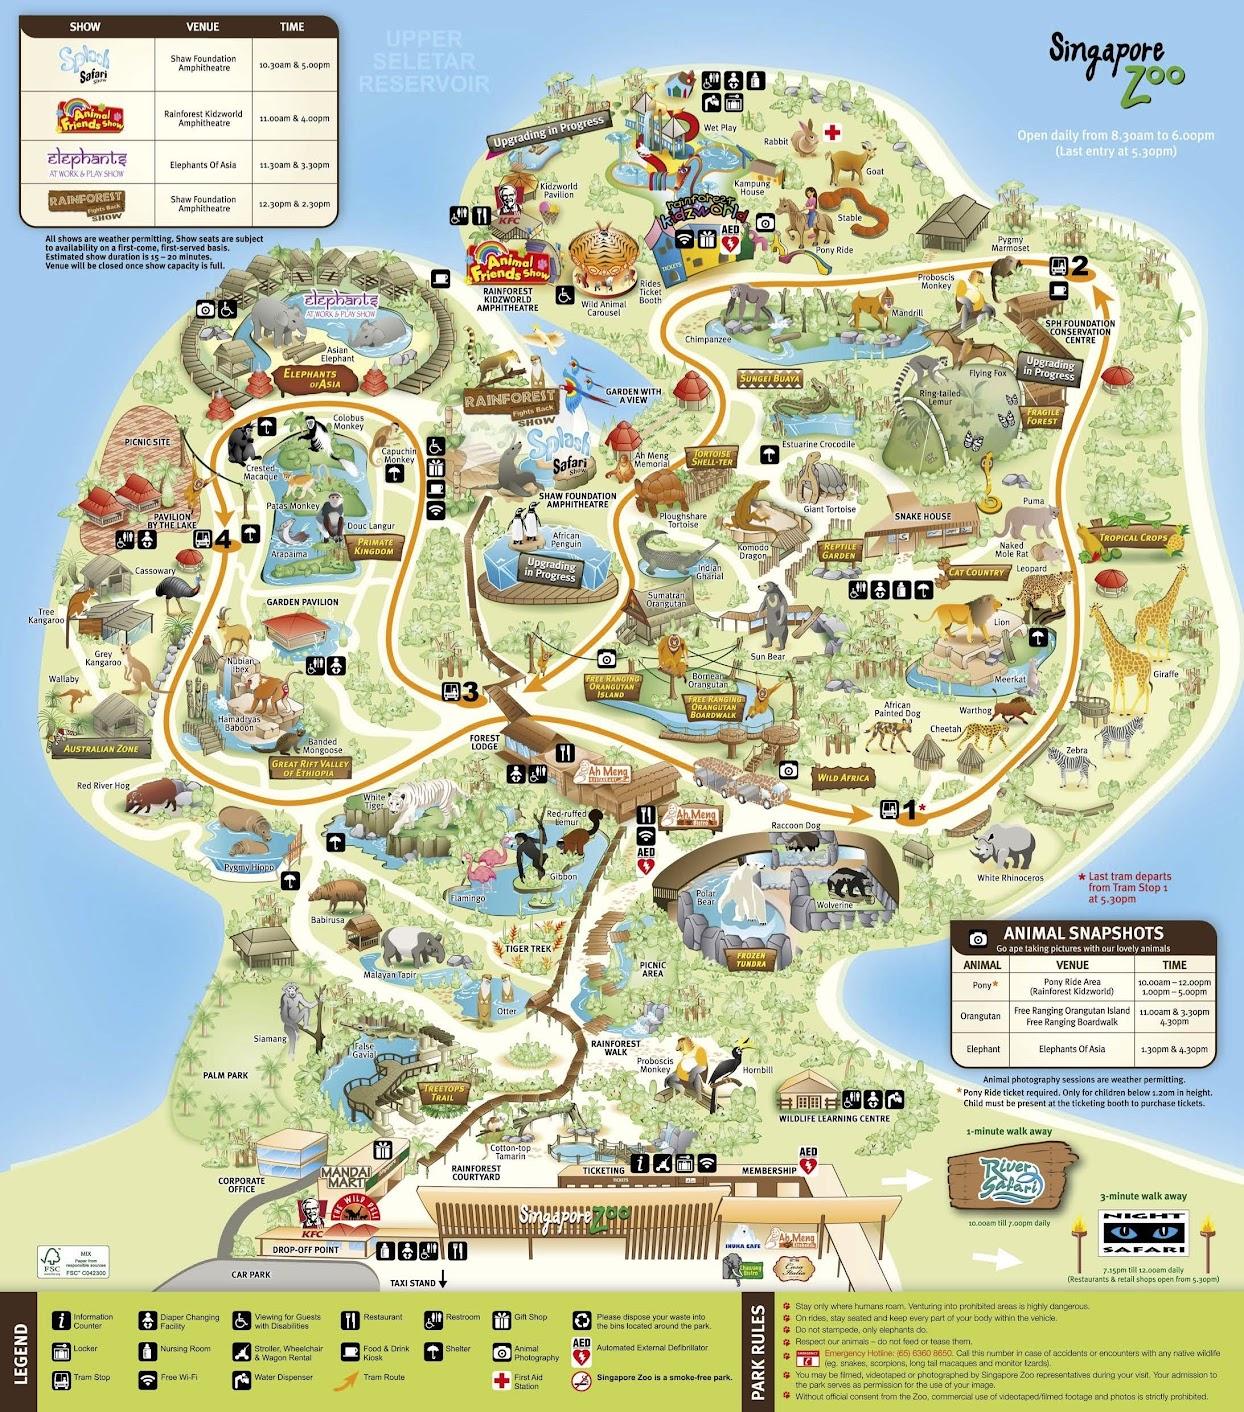 Singapore Zoo map